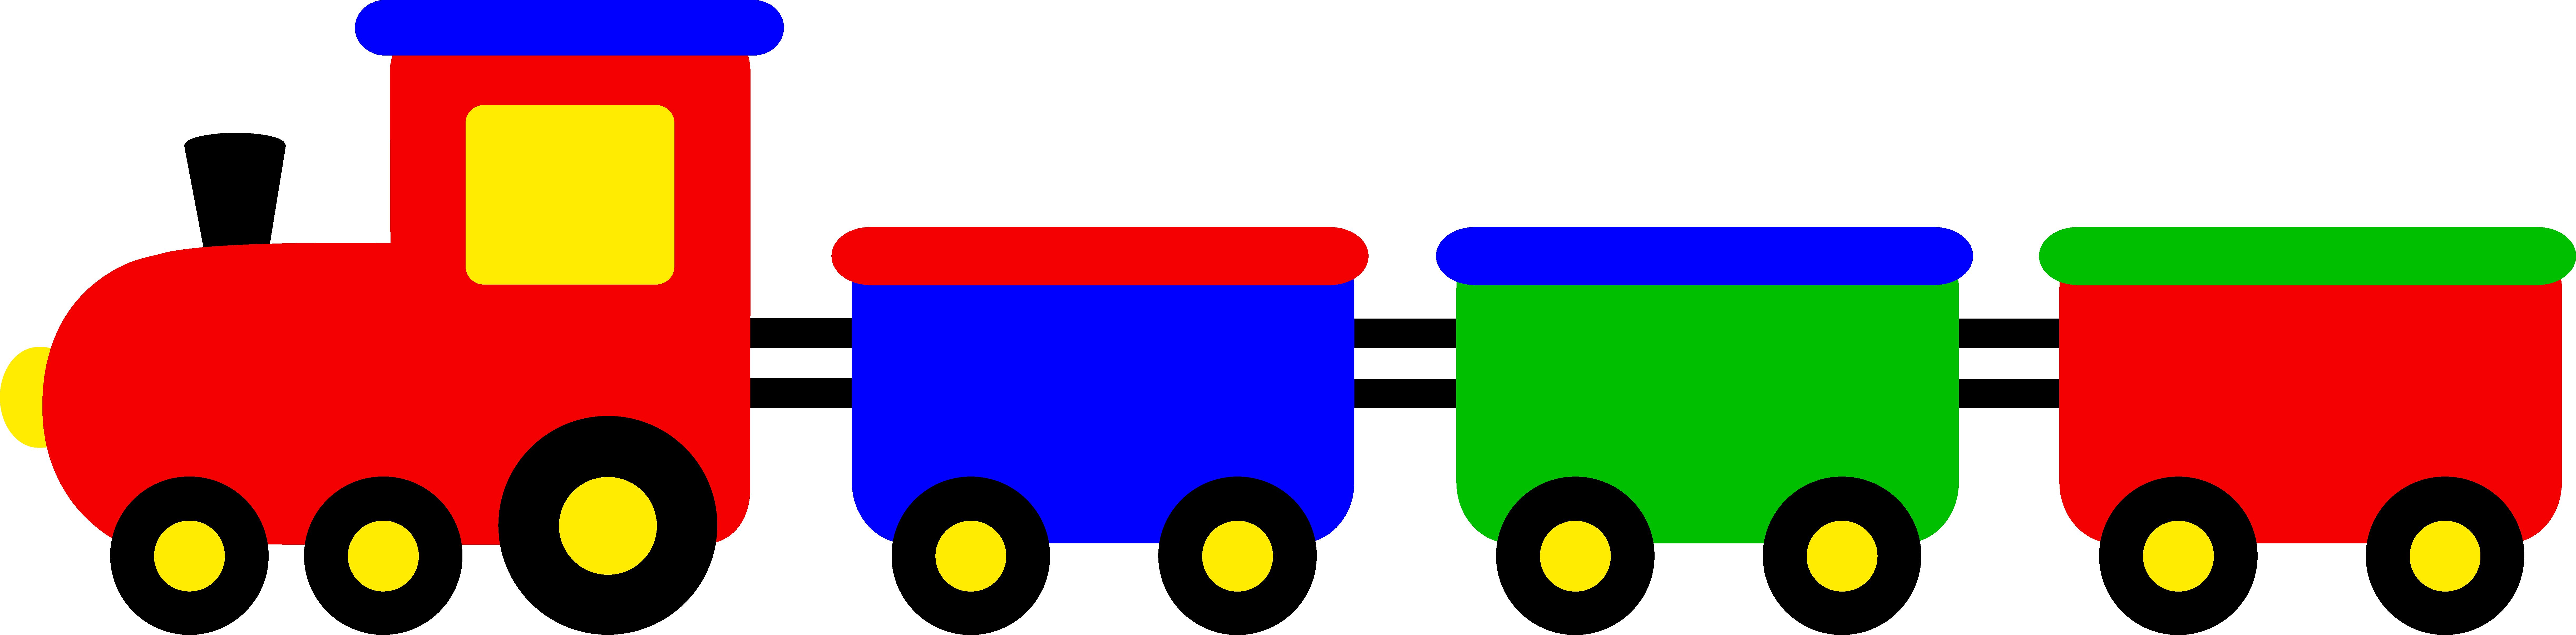 Free Train Car Clipart, Download Free Clip Art, Free Clip.